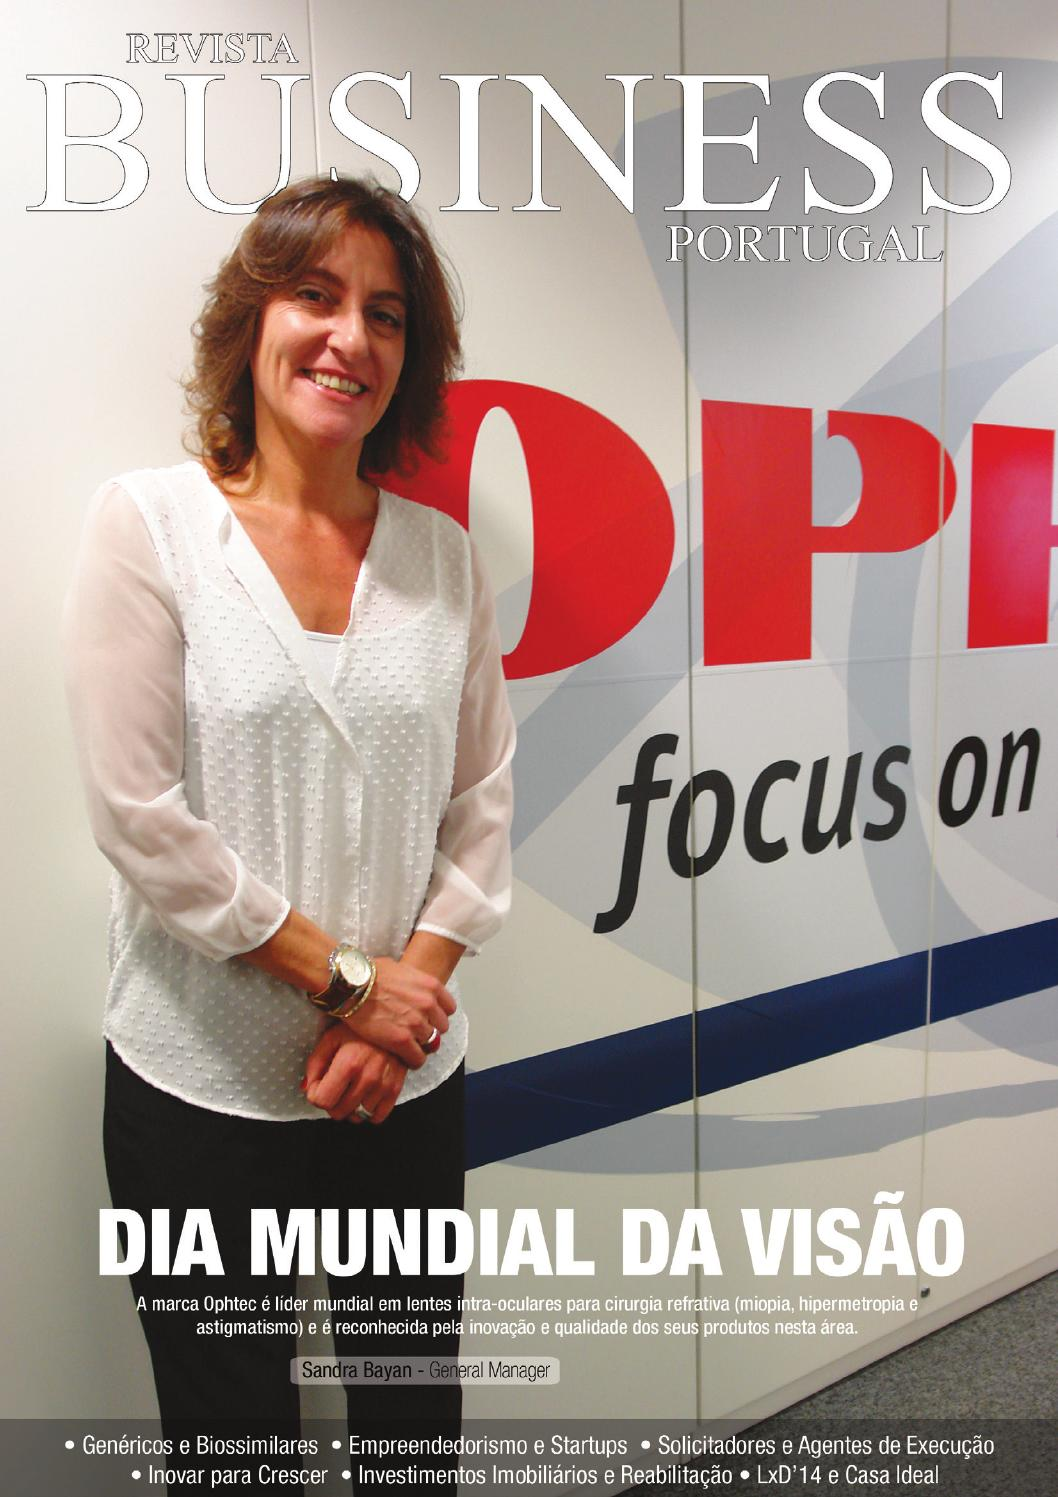 Revista Business Portugal   Setembro  14 by Revista Business Portugal -  issuu 84f6ec8cd3